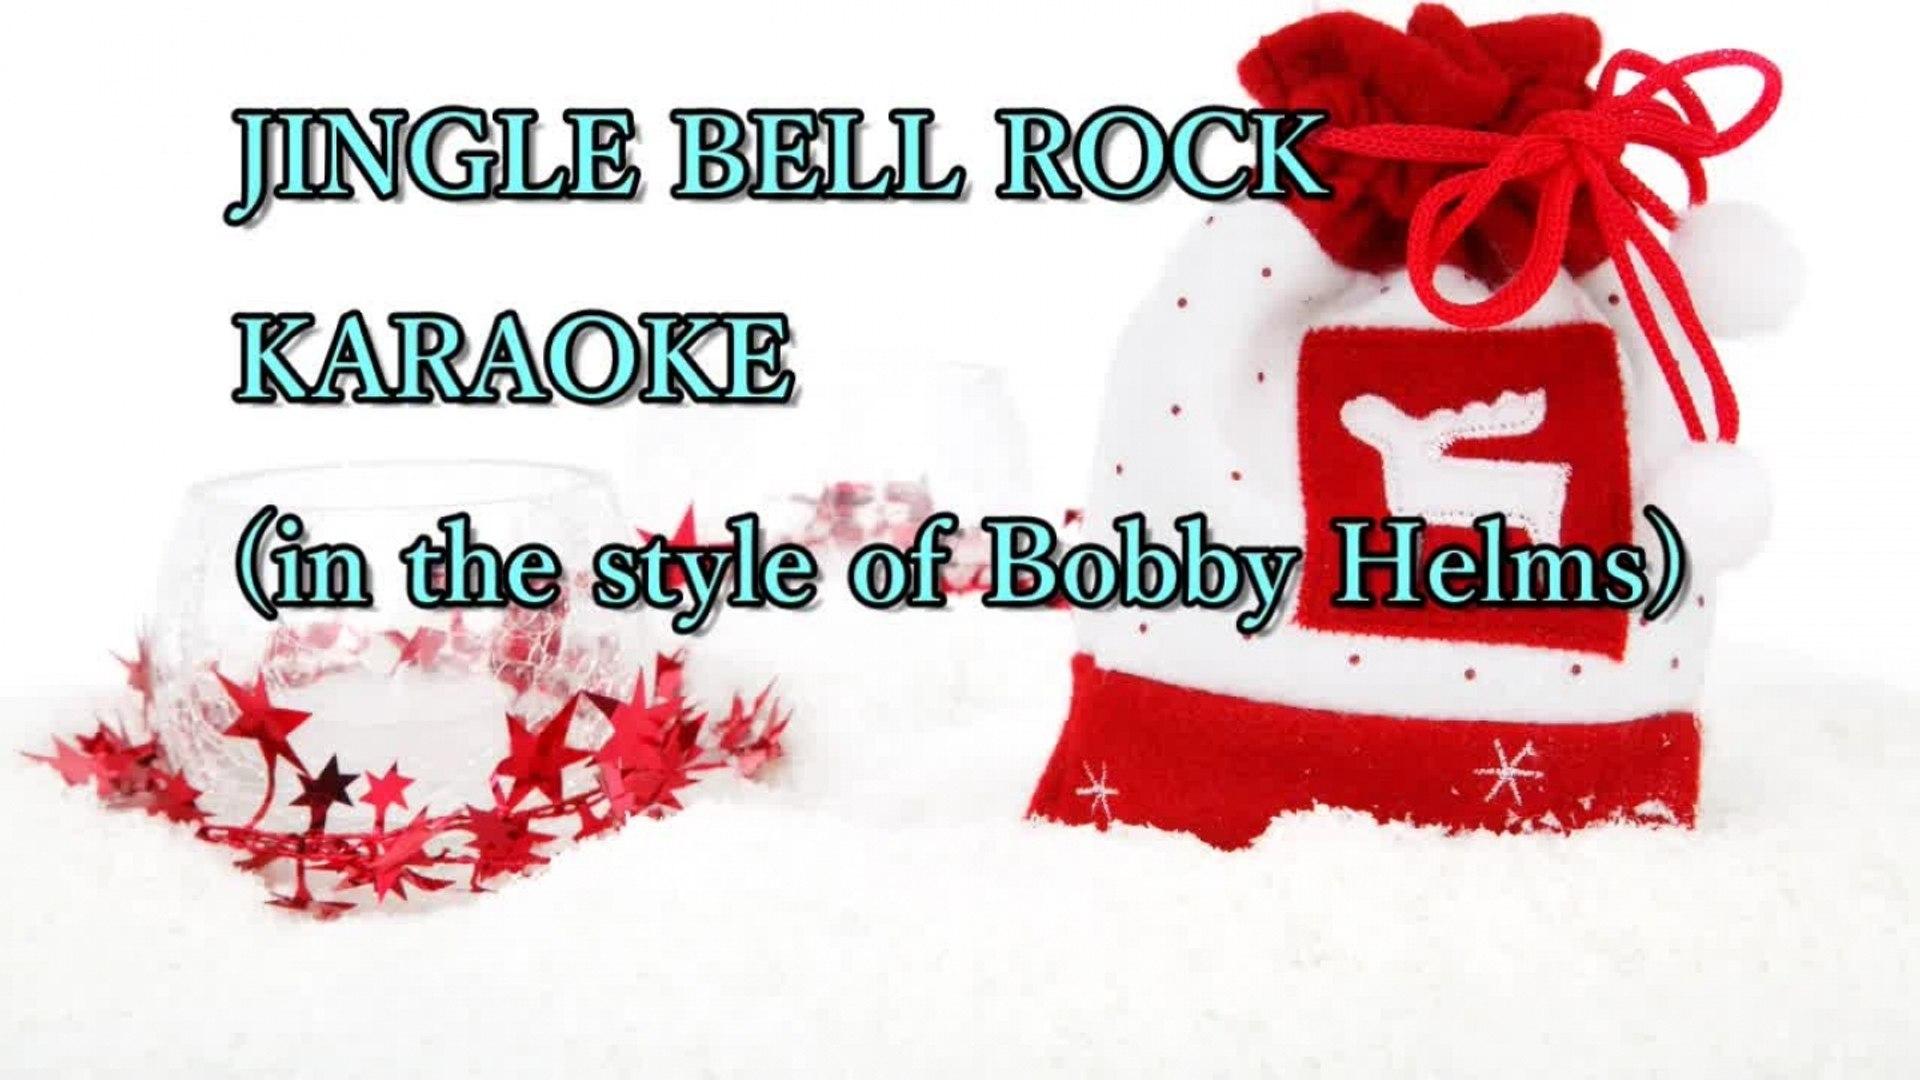 Christmas Songs - Jingle Bell Rock - BEST KARAOKE in style of BOBBY HELMS - with lyrics on screen